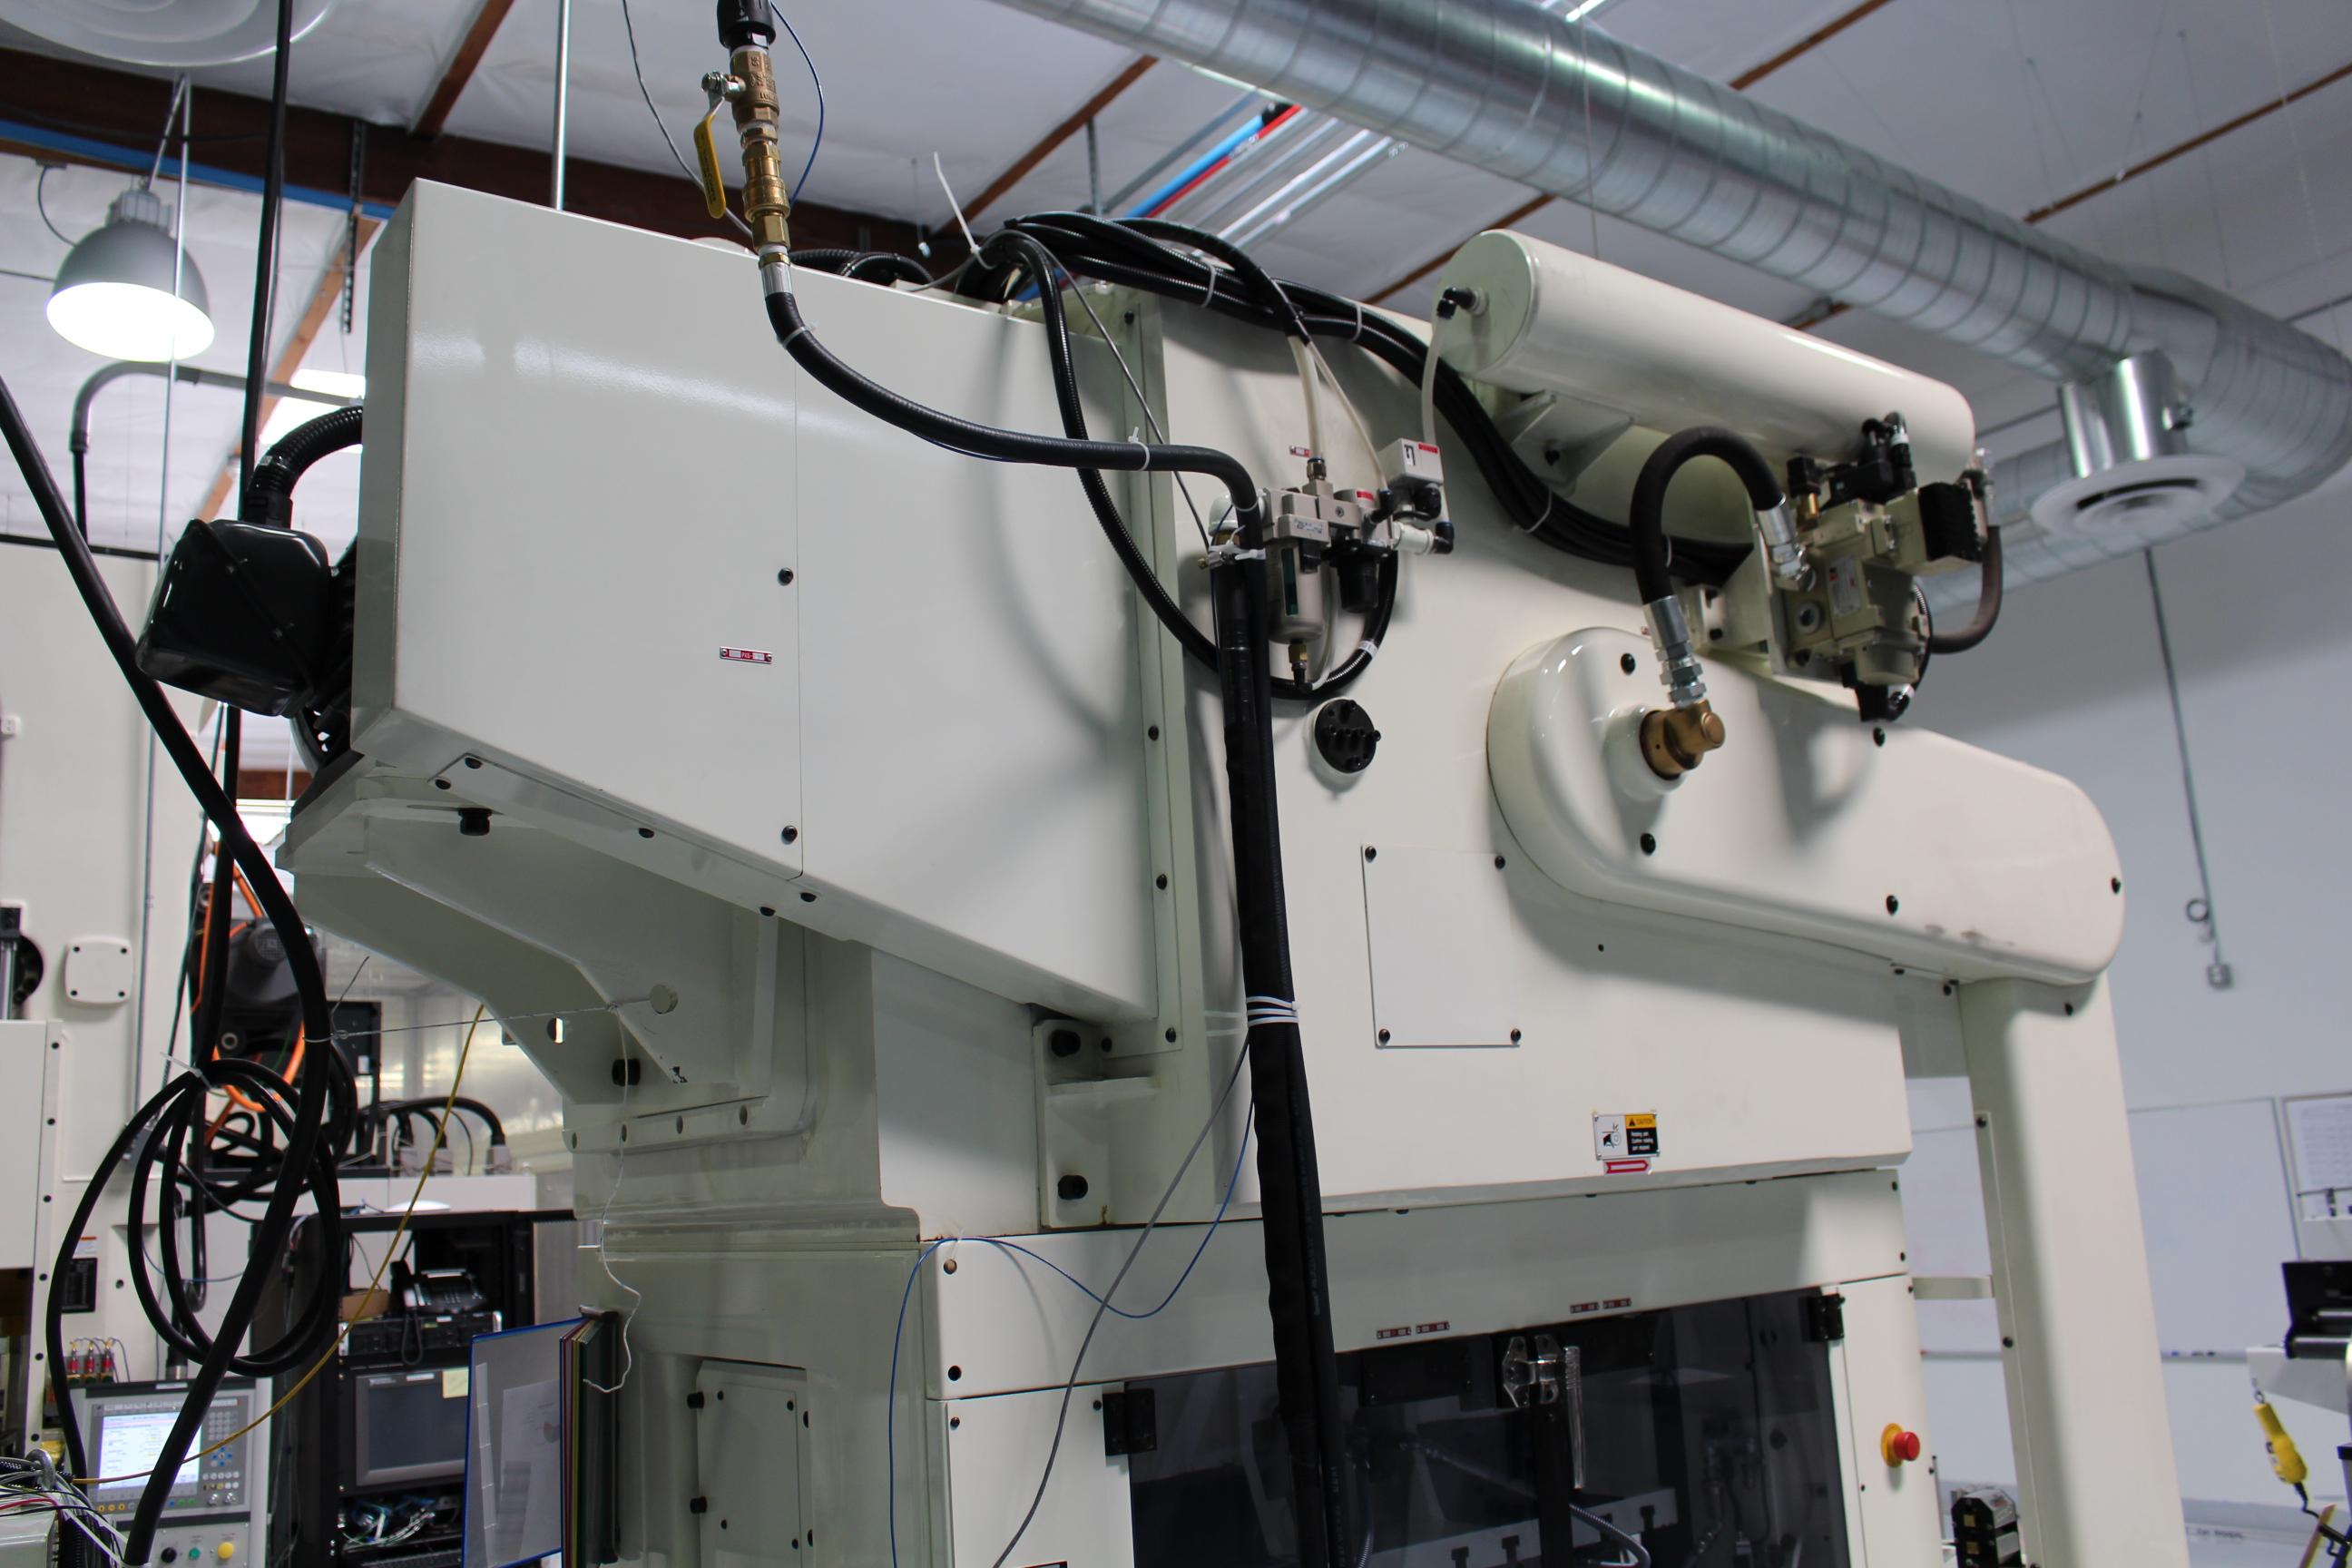 Lot 2 - 2012 NIDEC MINSTER HIGH SPEED STAMPING PRESS, KYORI SERIES, MODEL ANEX-60 II, 650 SPM